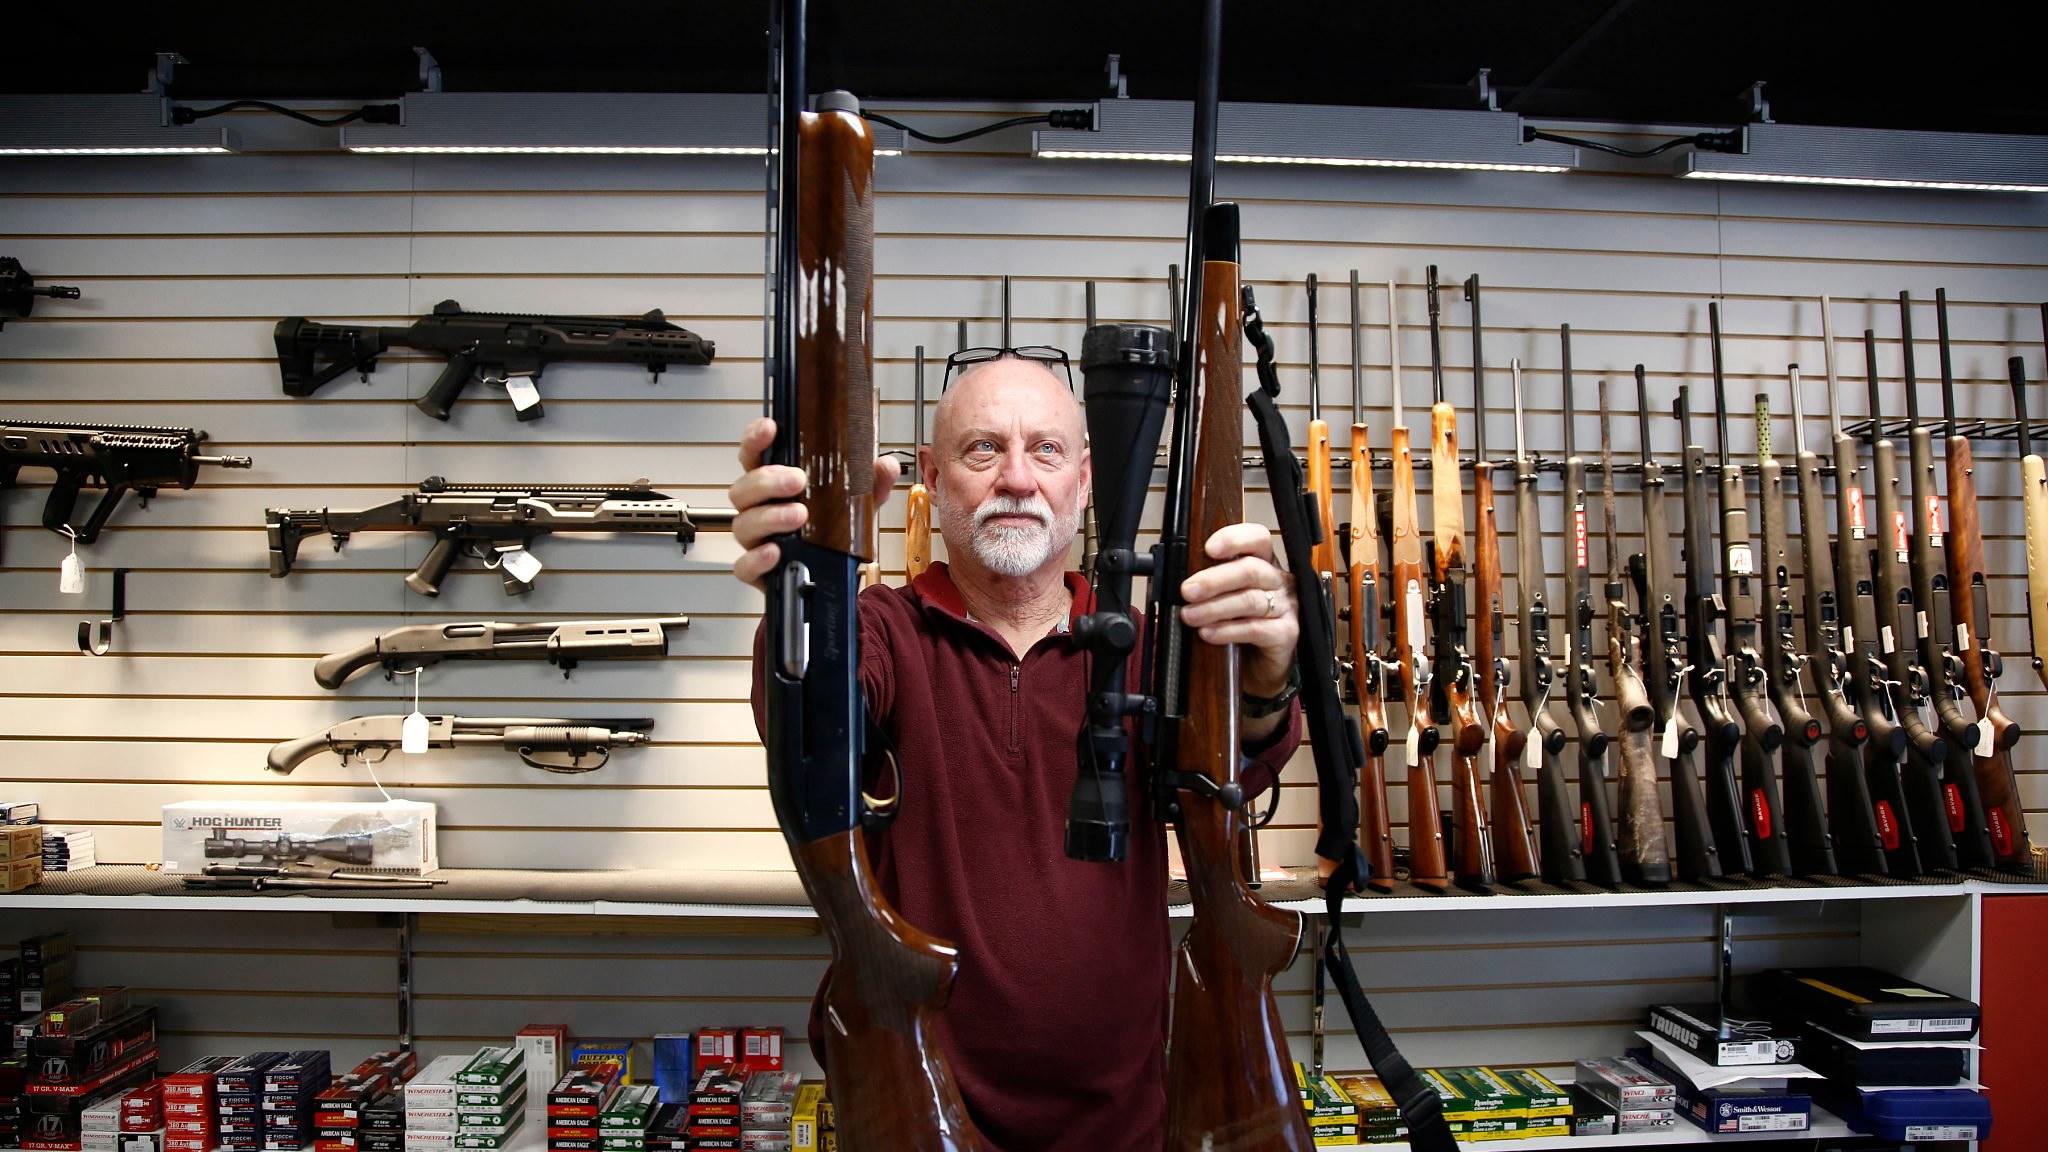 The Heat: US anti-gun movement intensifies after Parkland shooting